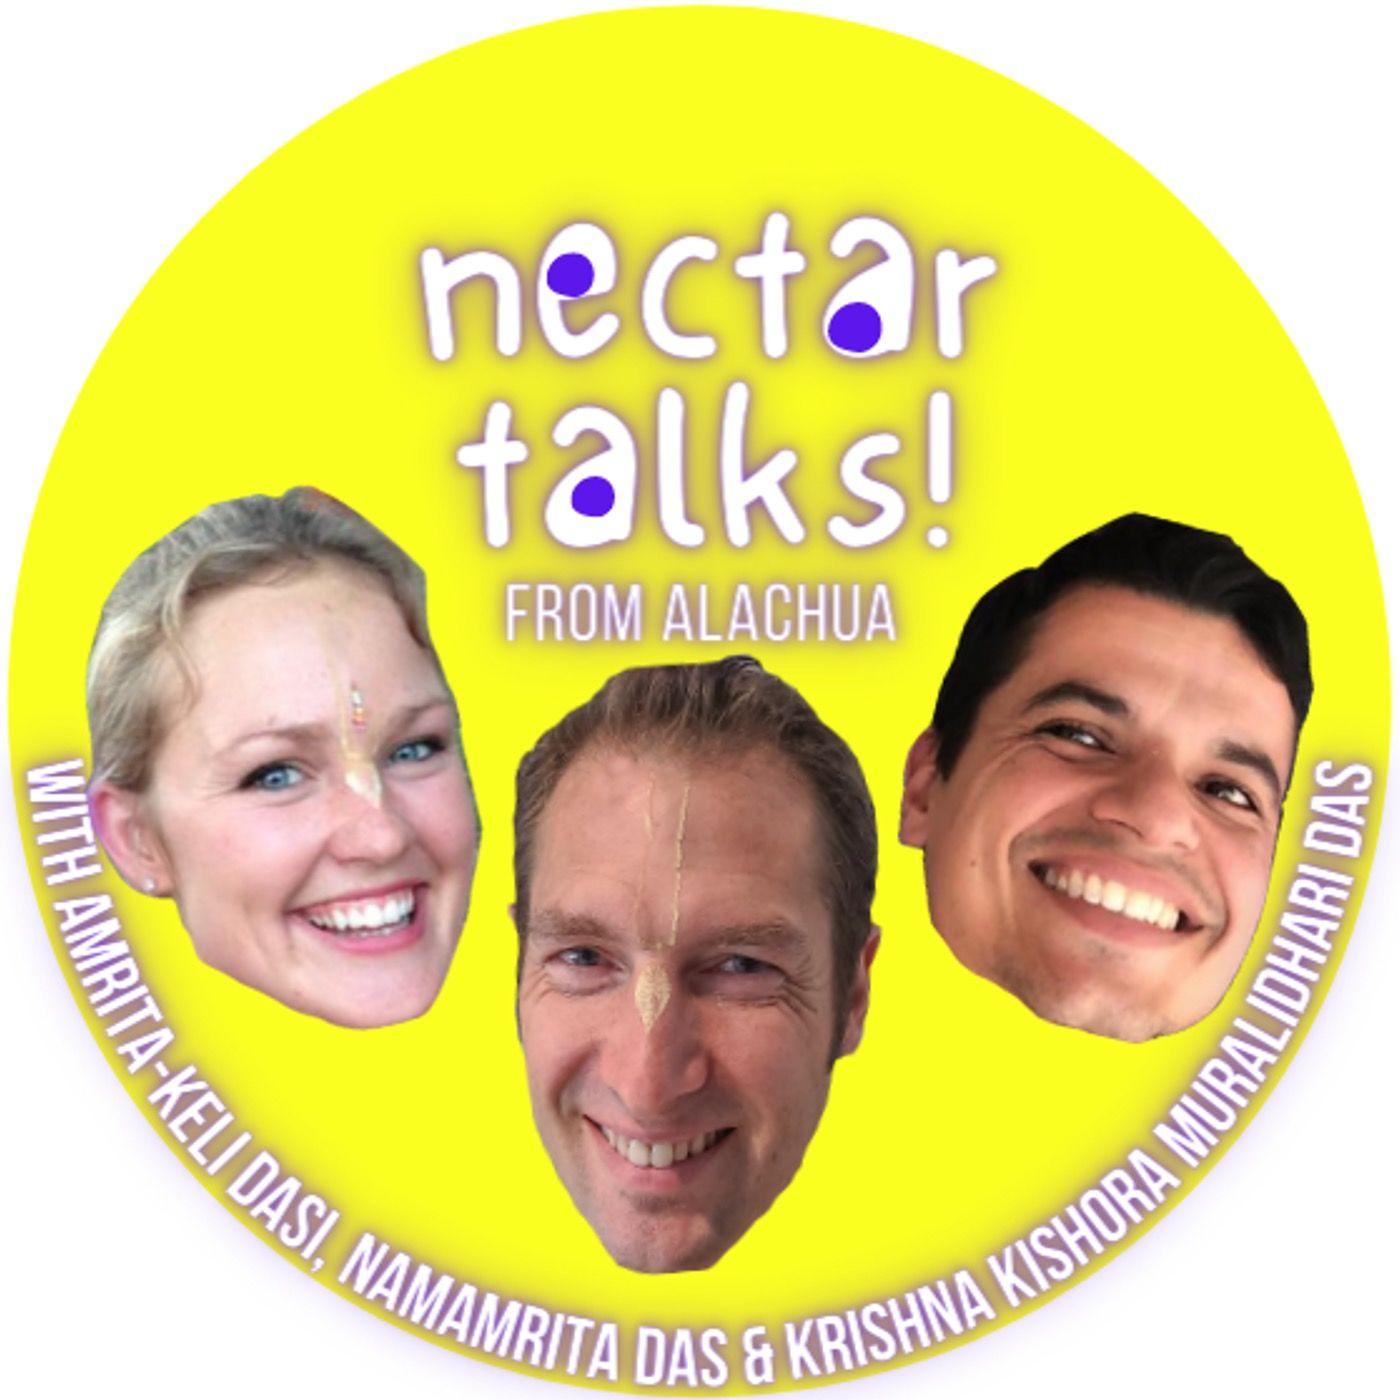 Nectar Talks